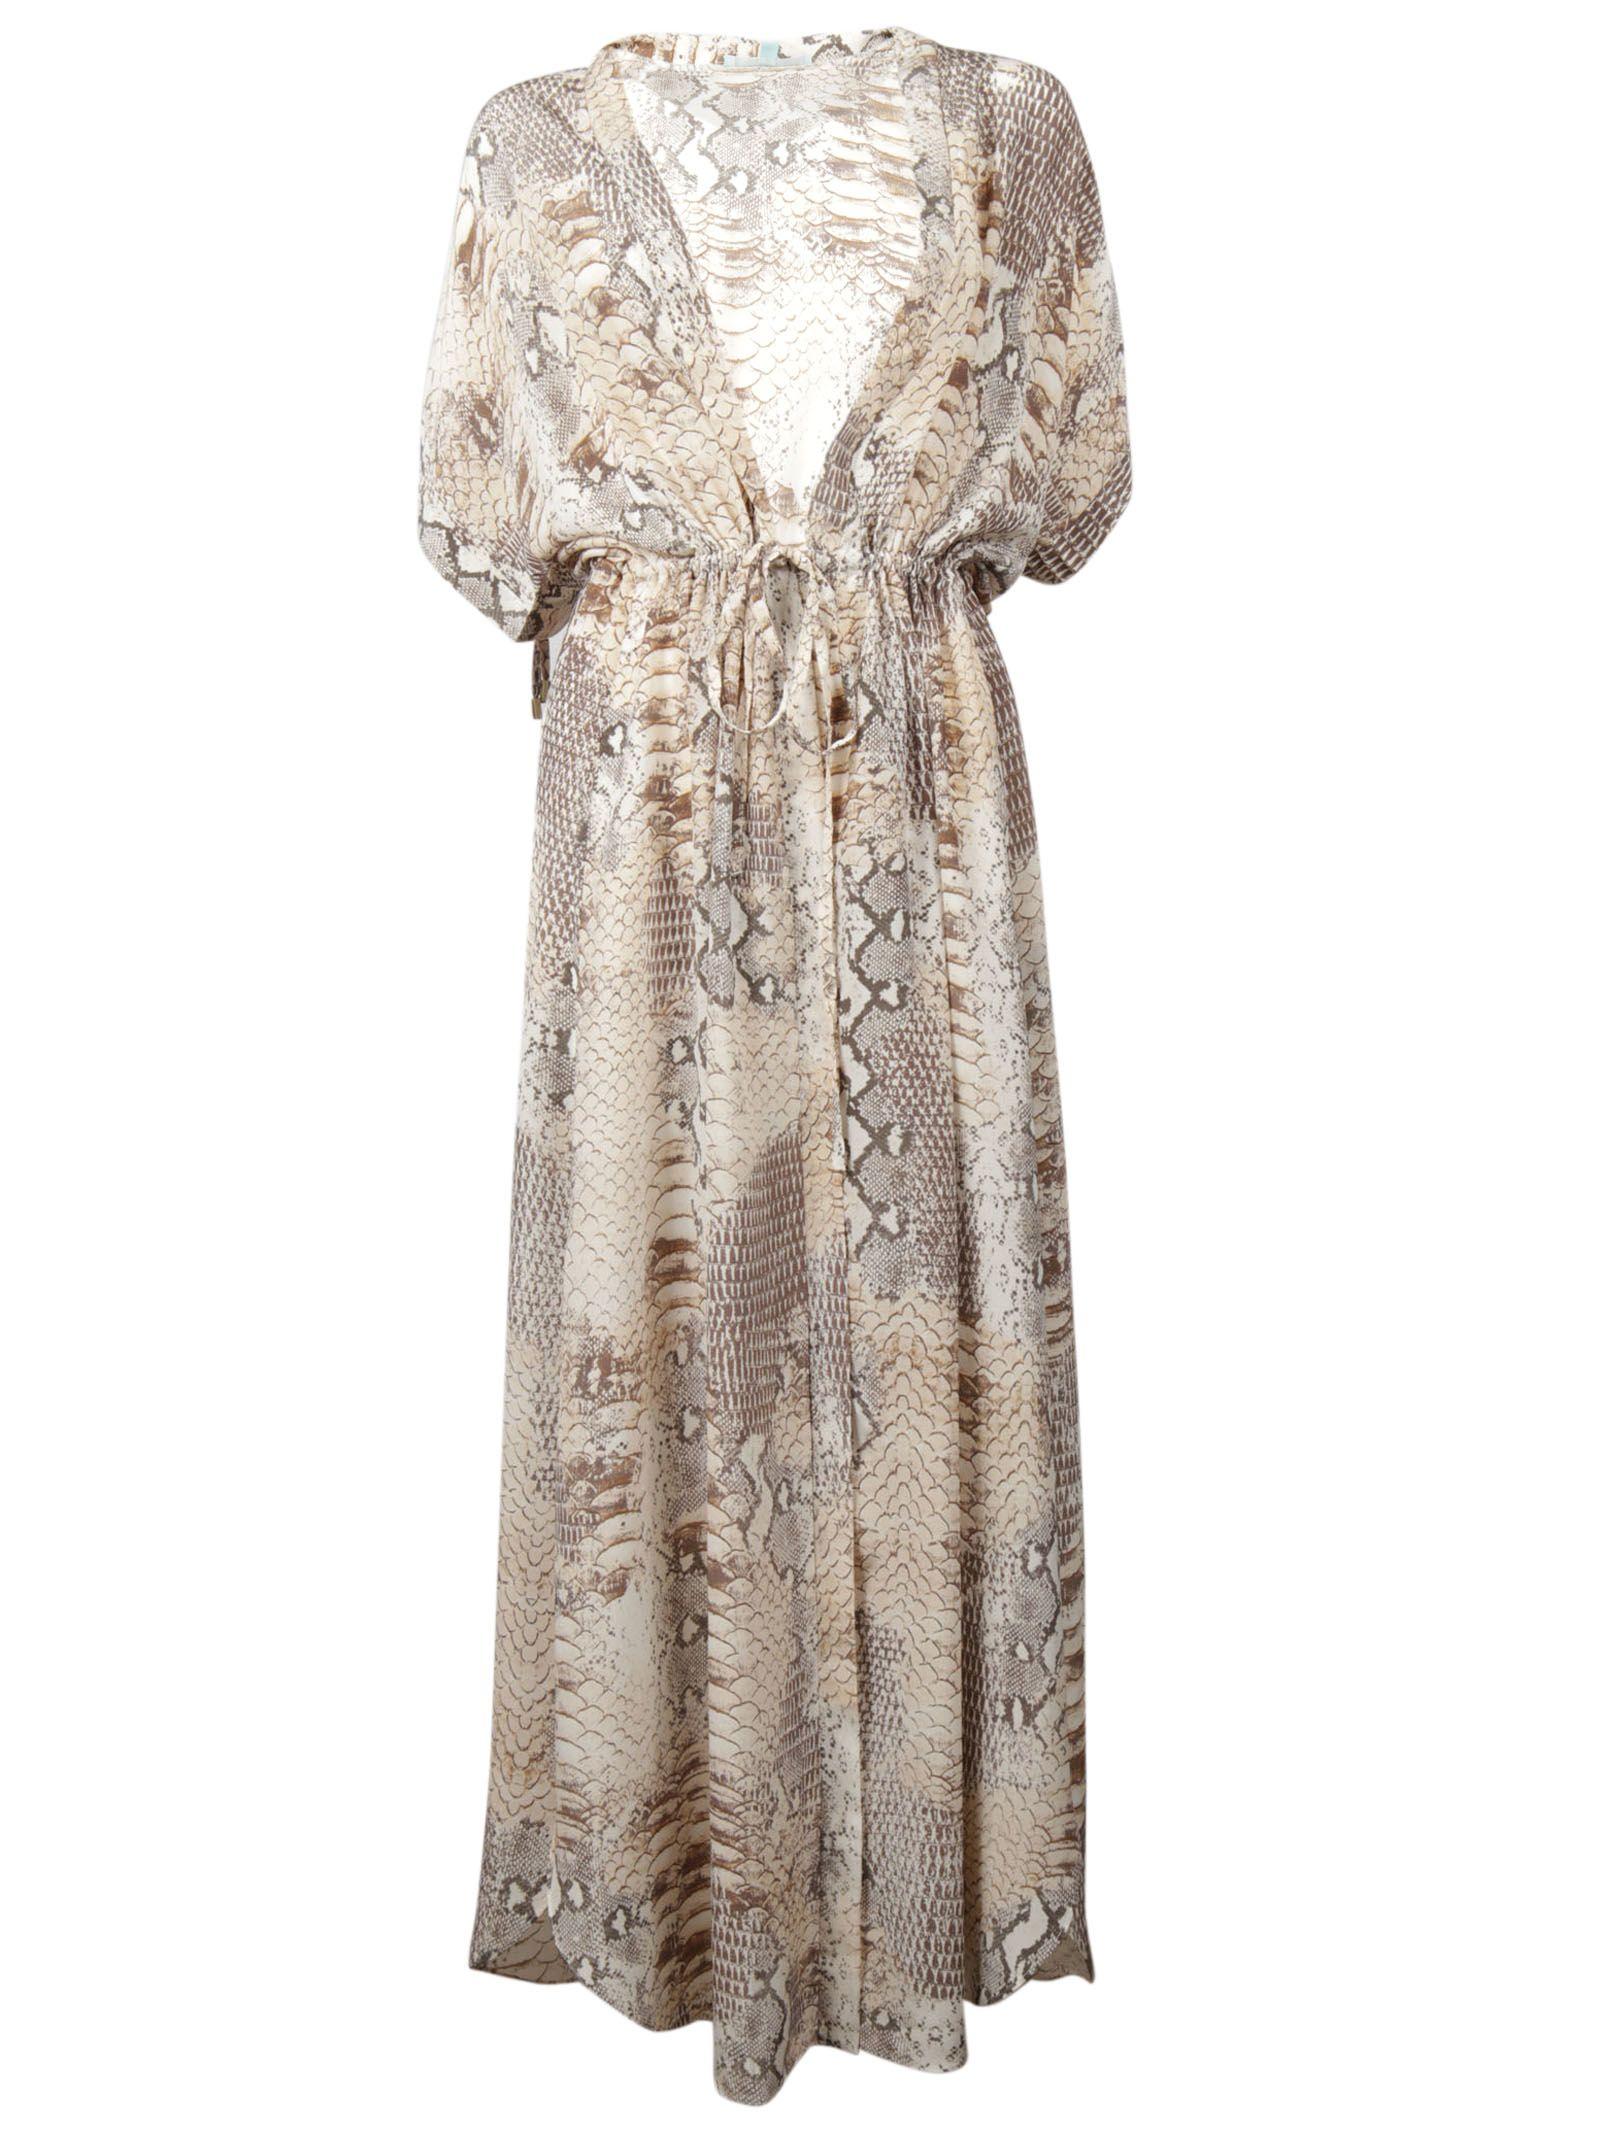 Melissa Odabash Keri Dress